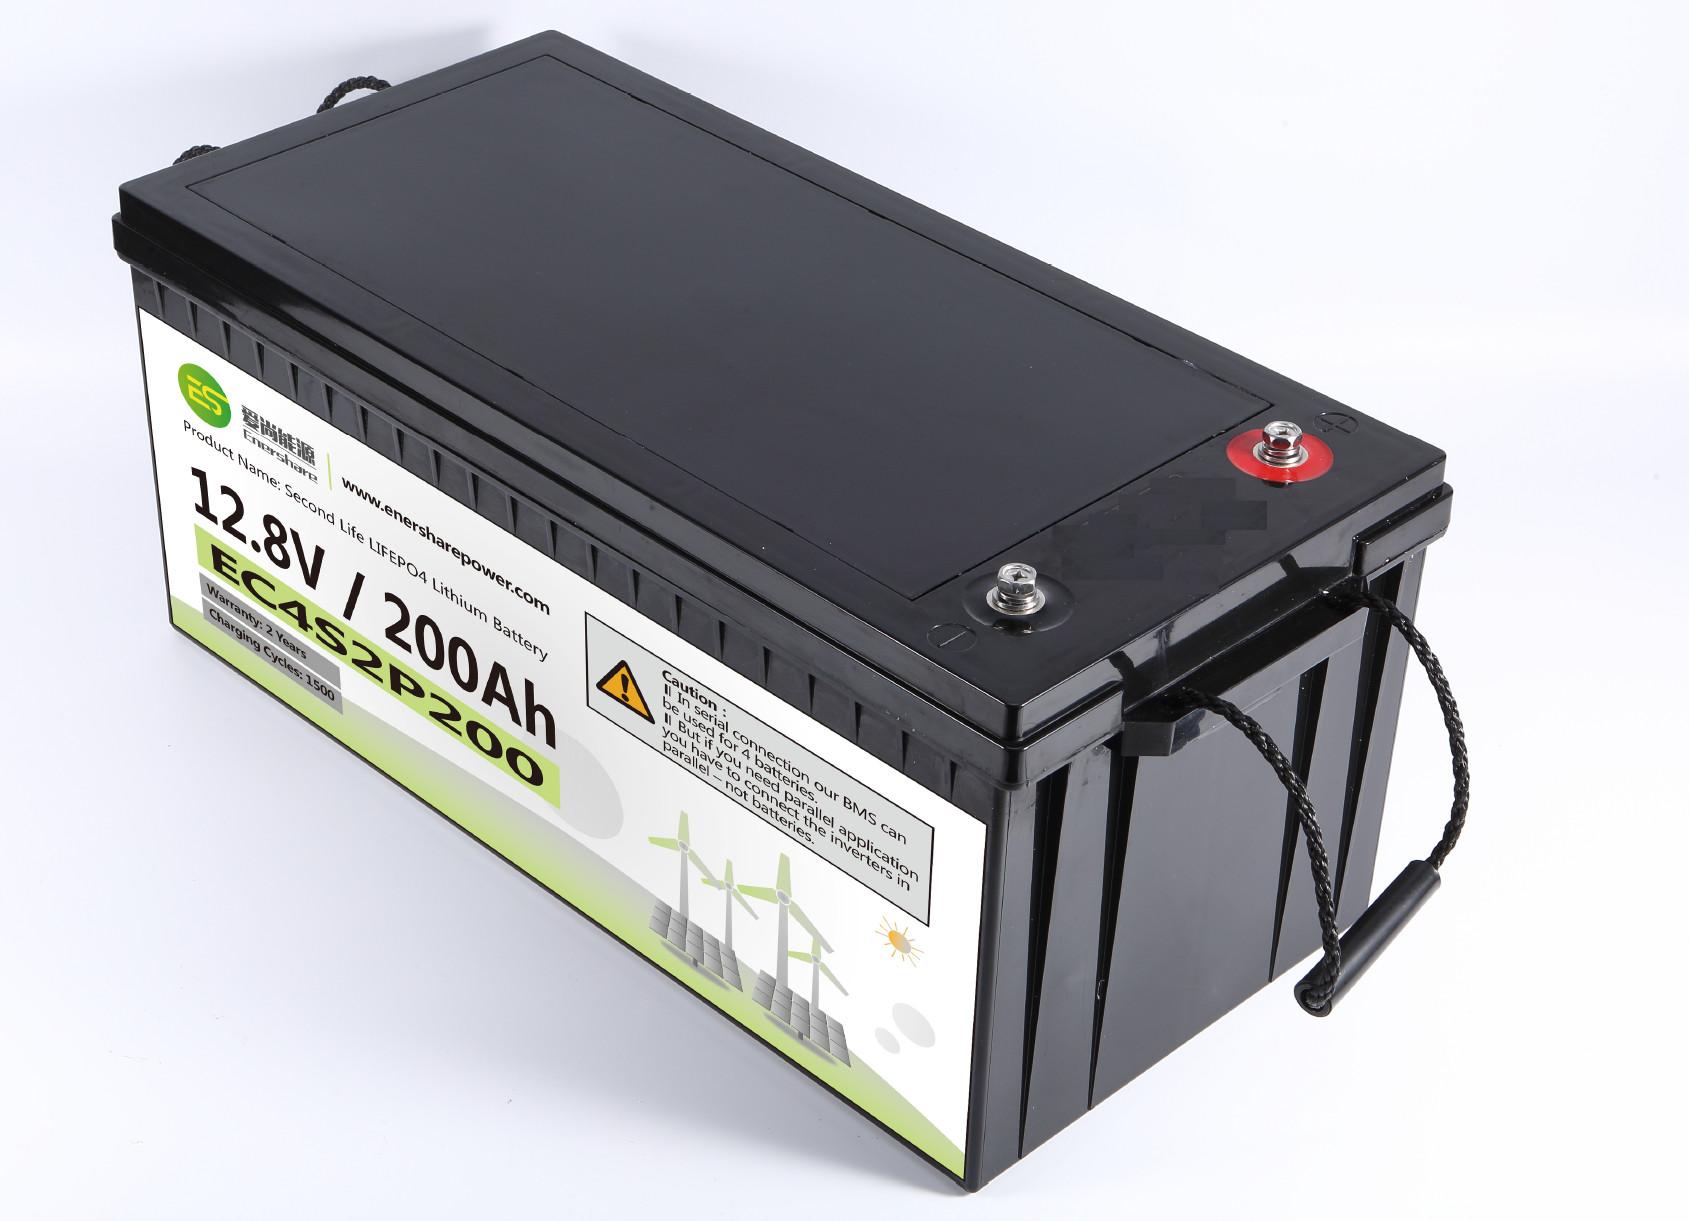 Solar Provides 3.6kw Power